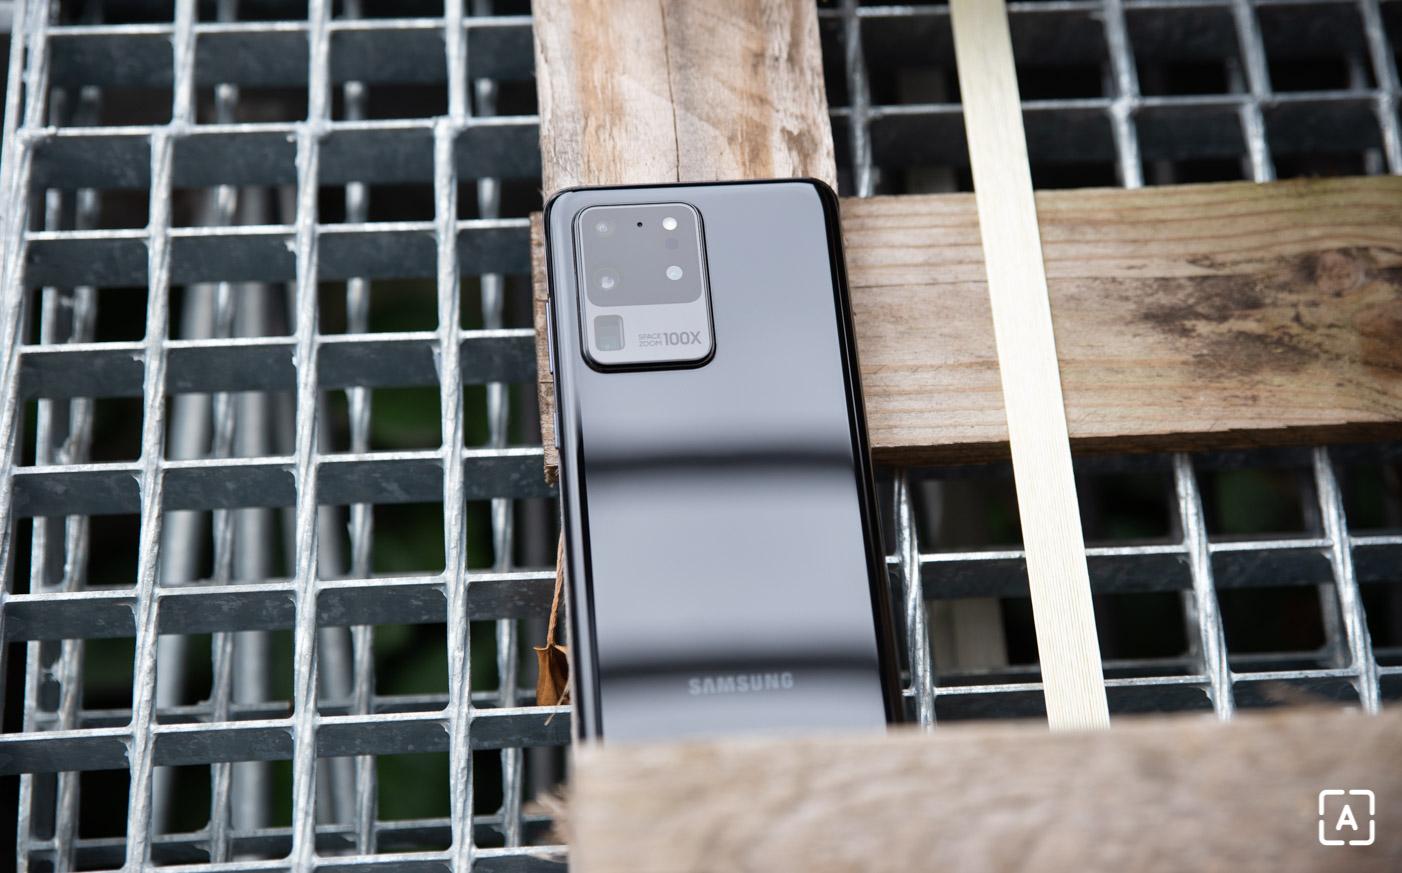 Samsung Galaxy S20 Ultra zoom